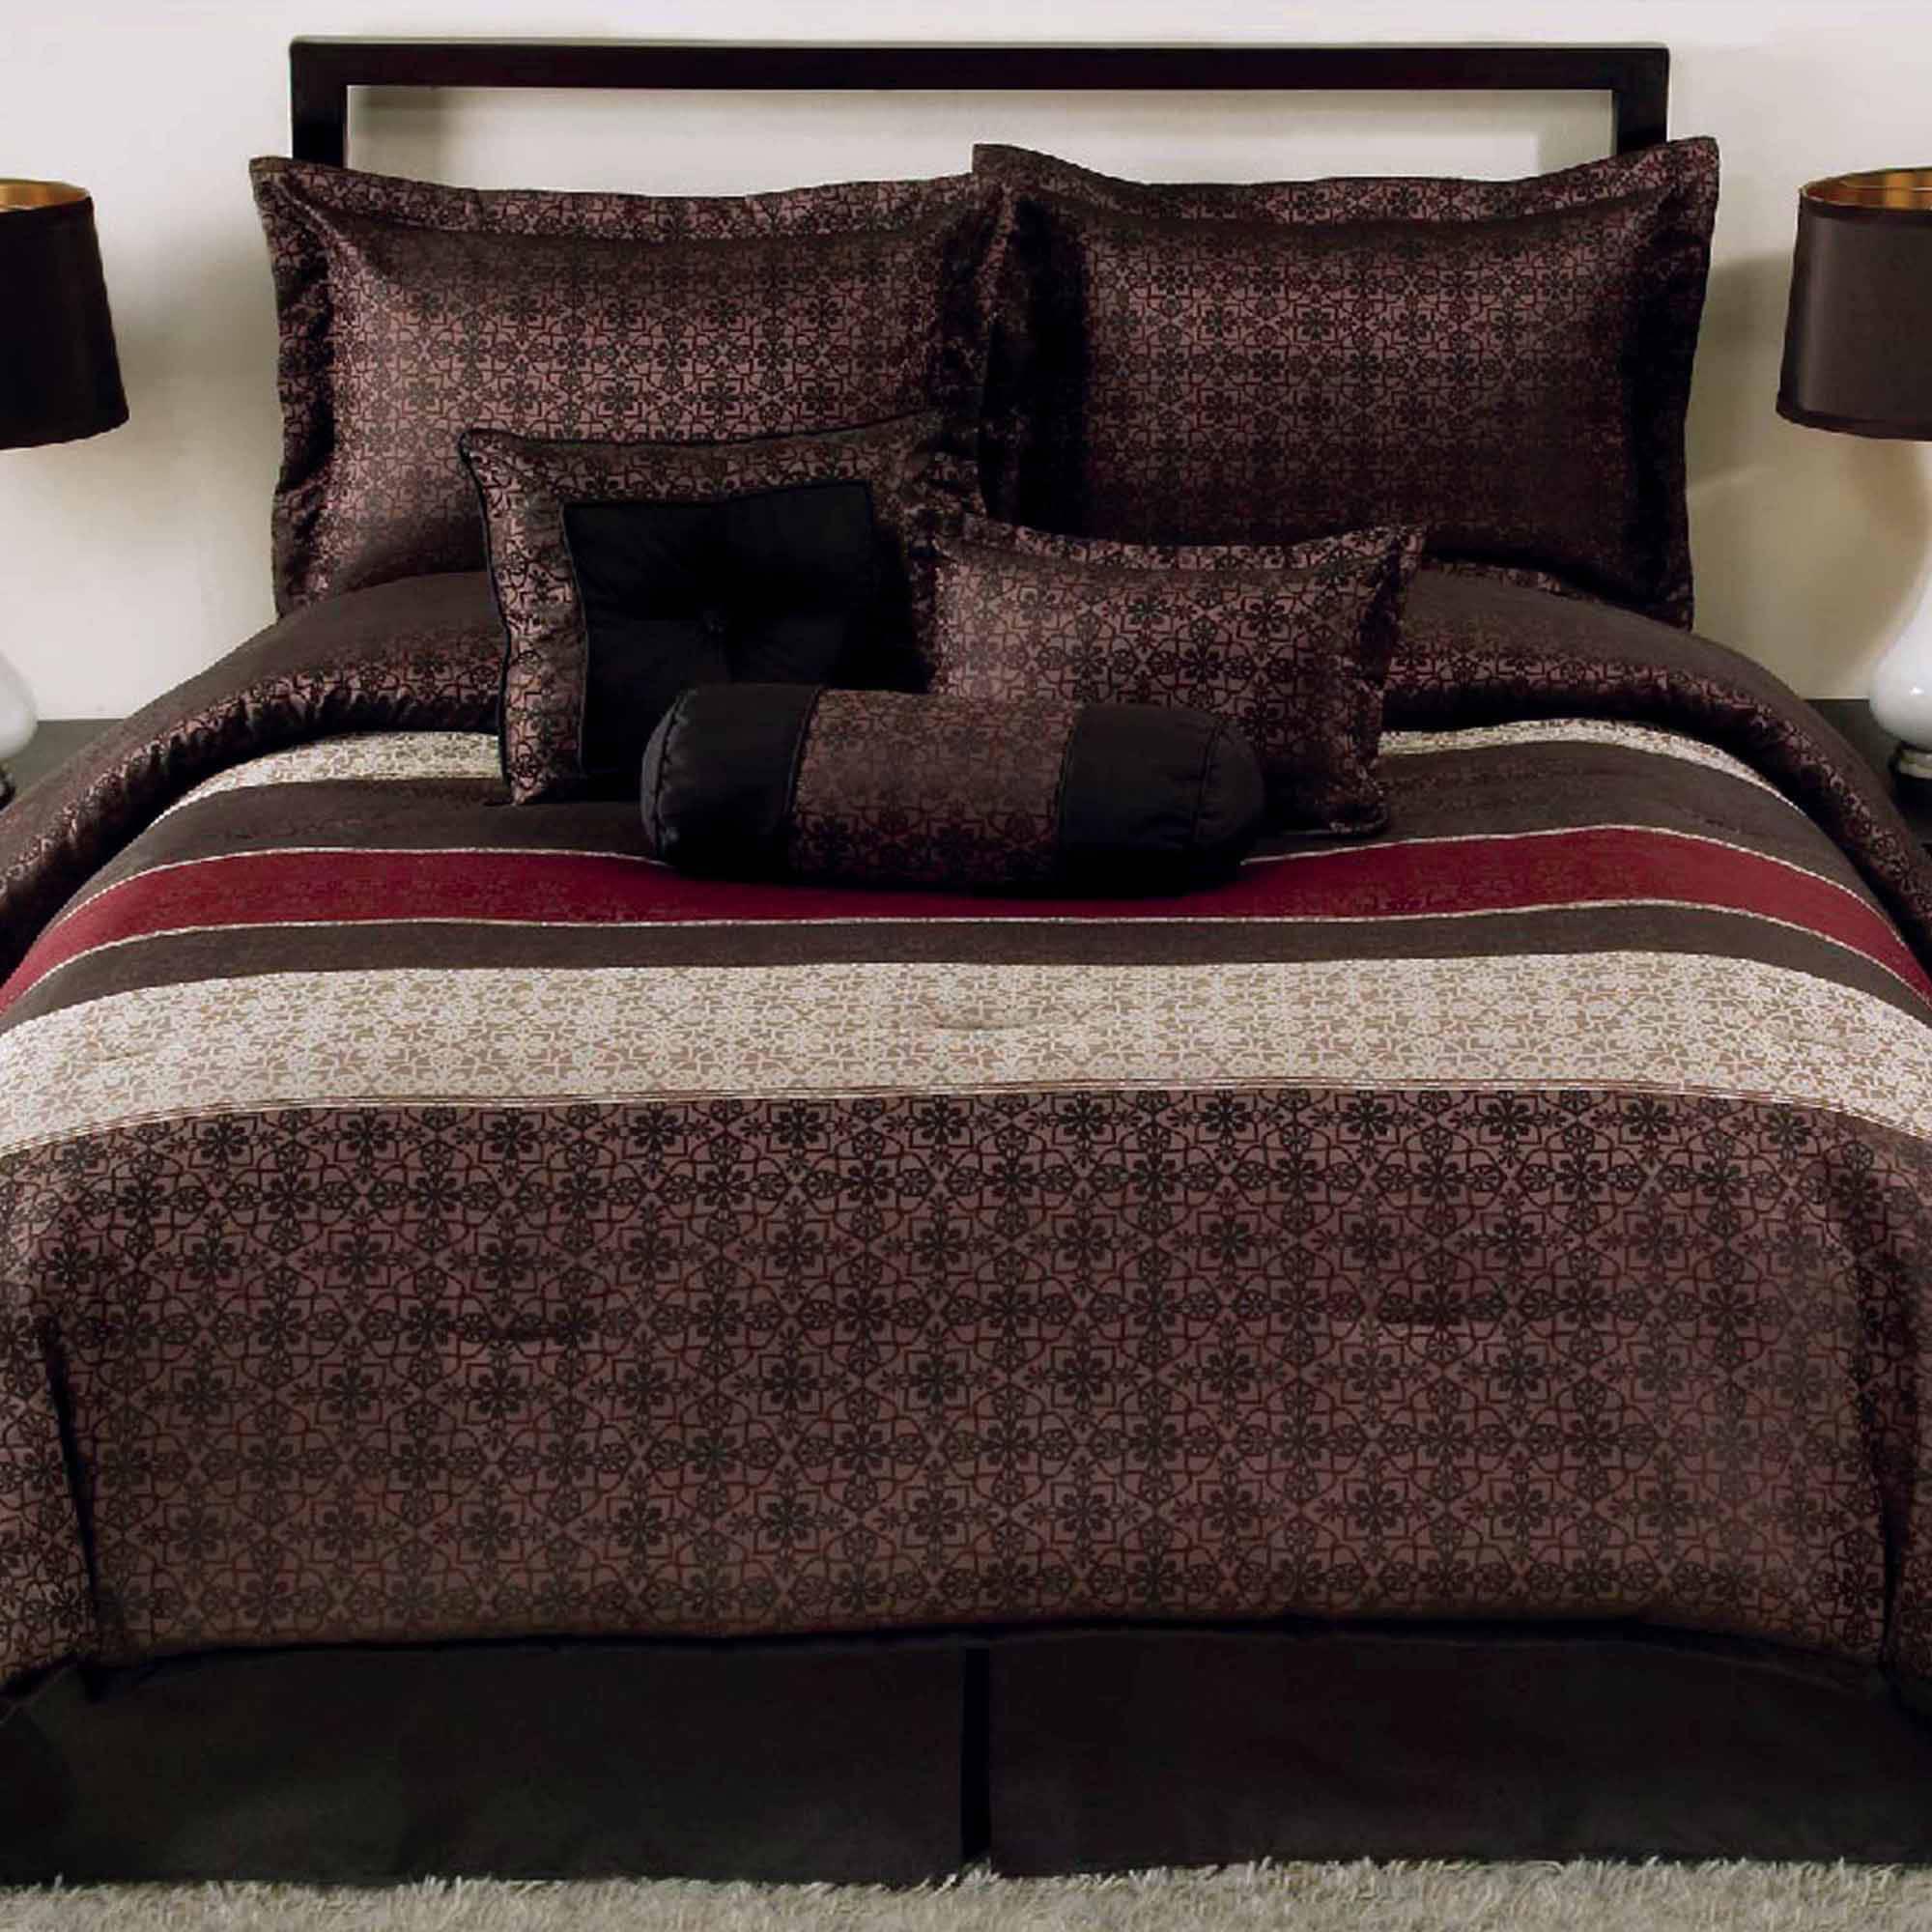 Mainstays Medici 7-Piece Comforter Set